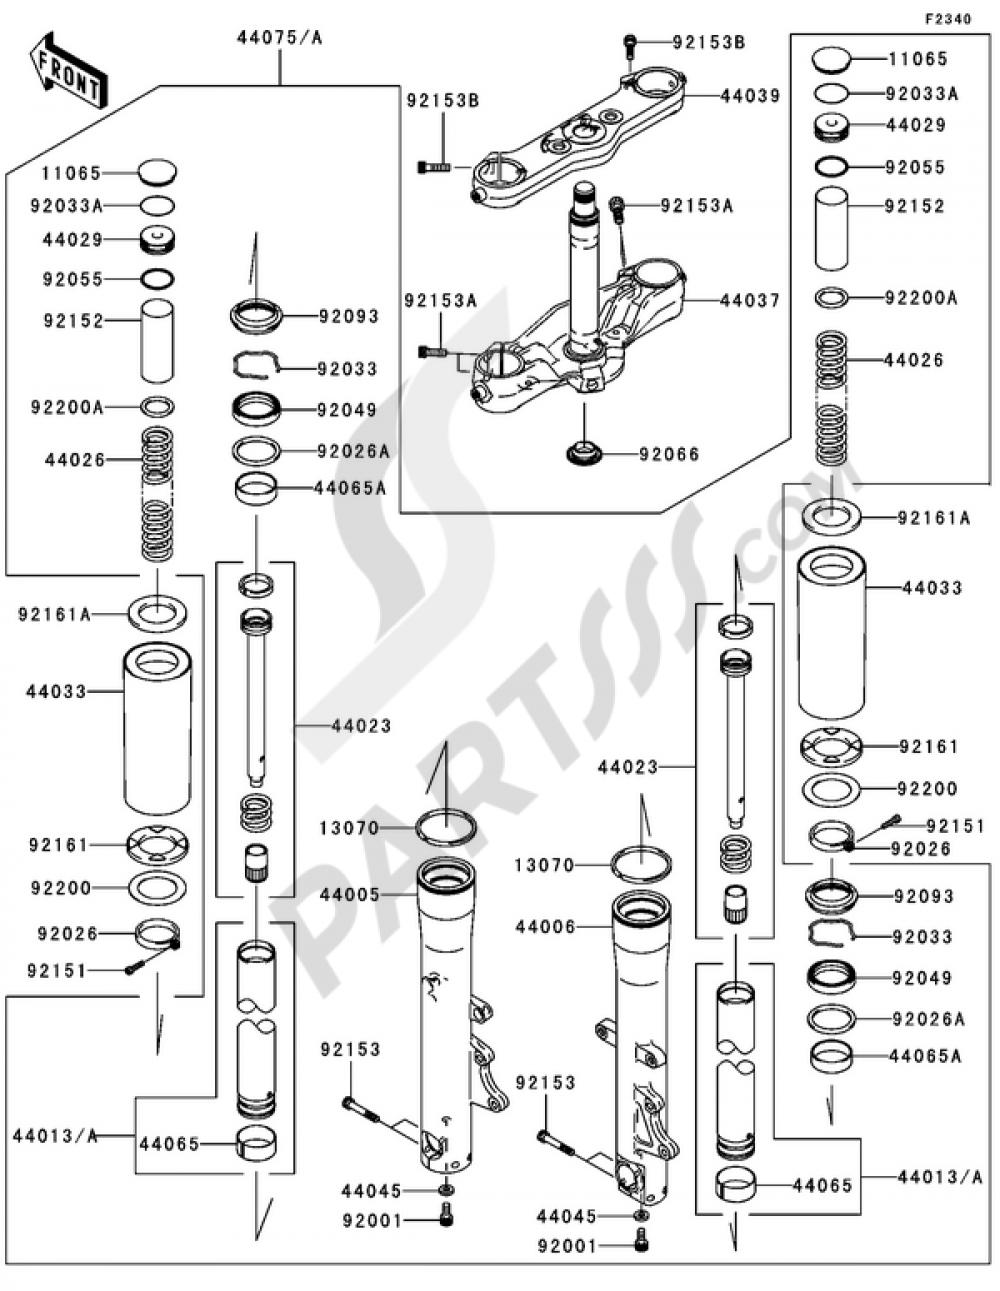 2004 Kawasaki Vn2000 Wiring Diagram. 2004 Kawasaki Kl250 ... on